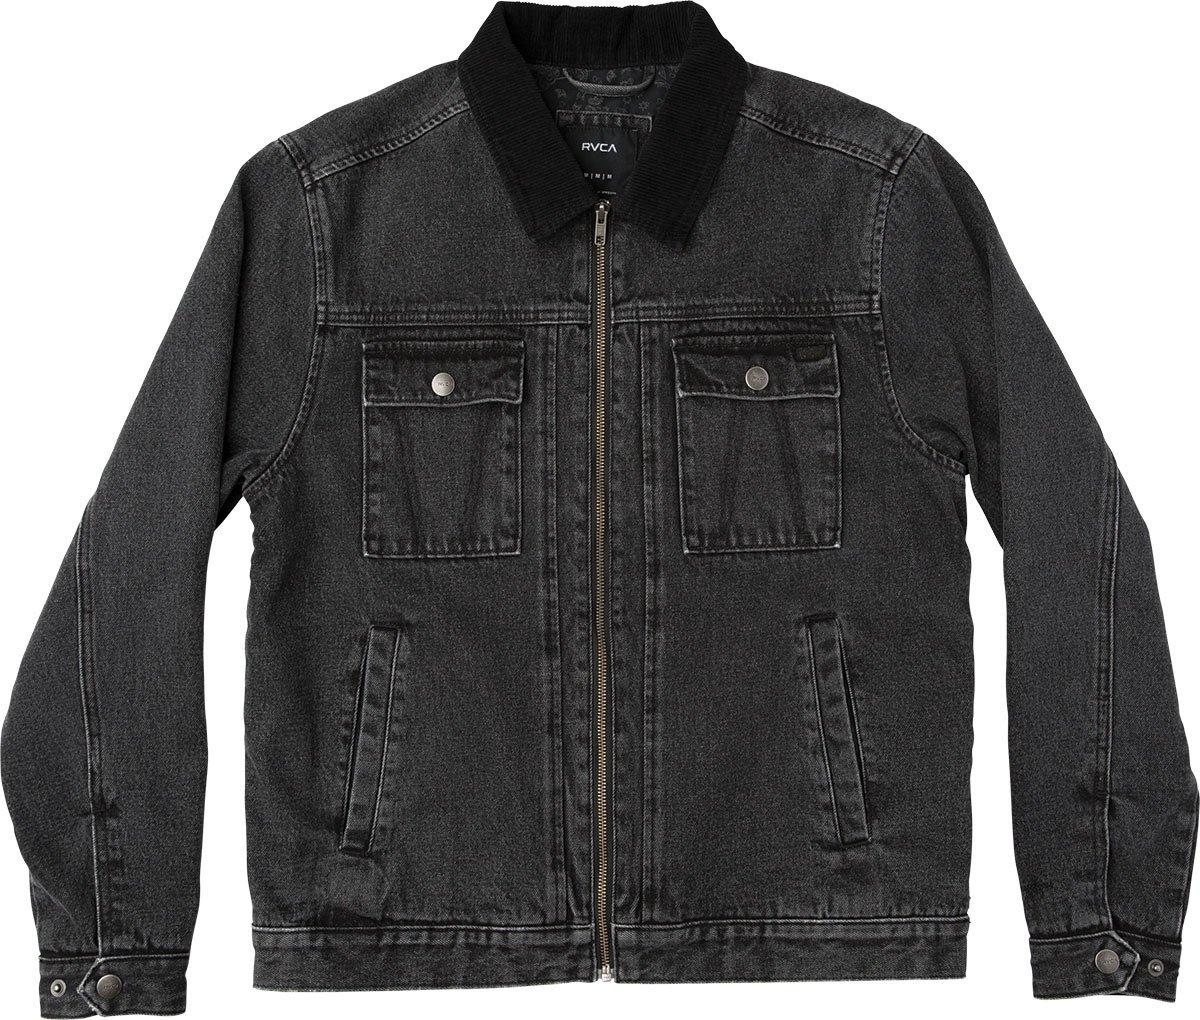 RVCA Men's Bando Jacket, Black, M